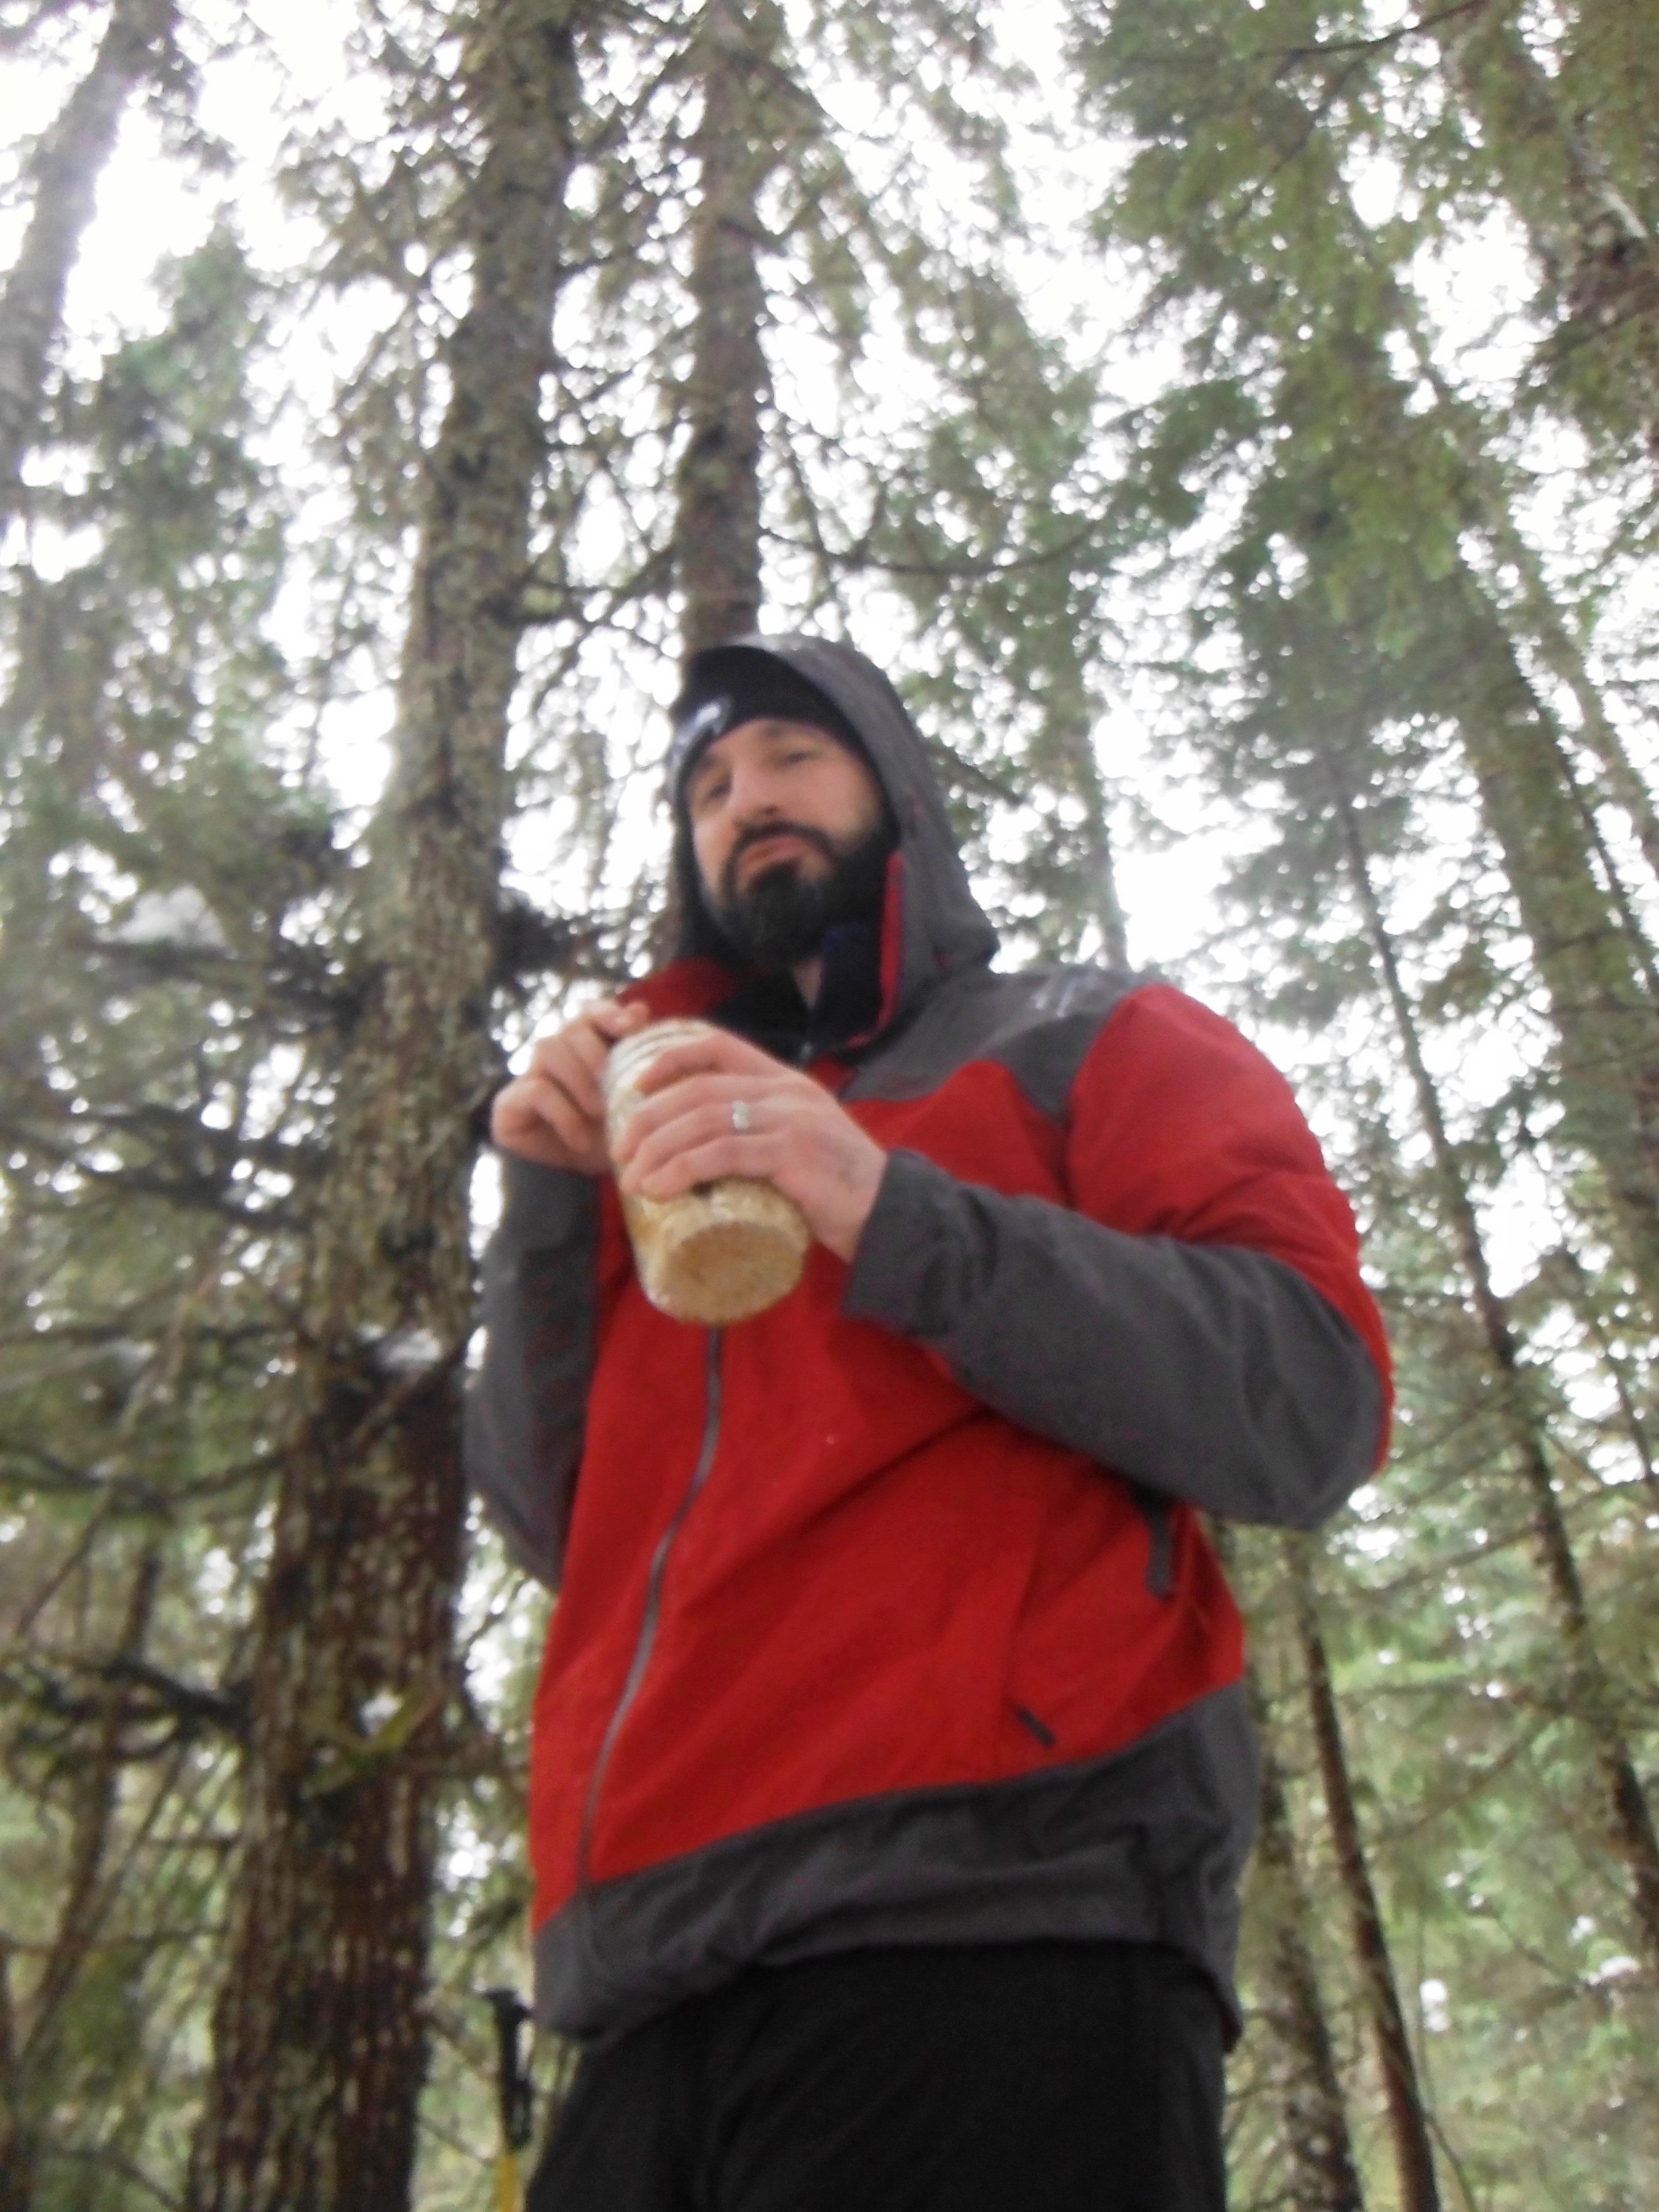 Outdoor Environmental Education Club leader Alessandro Scilletta regards a resting snowshoer.